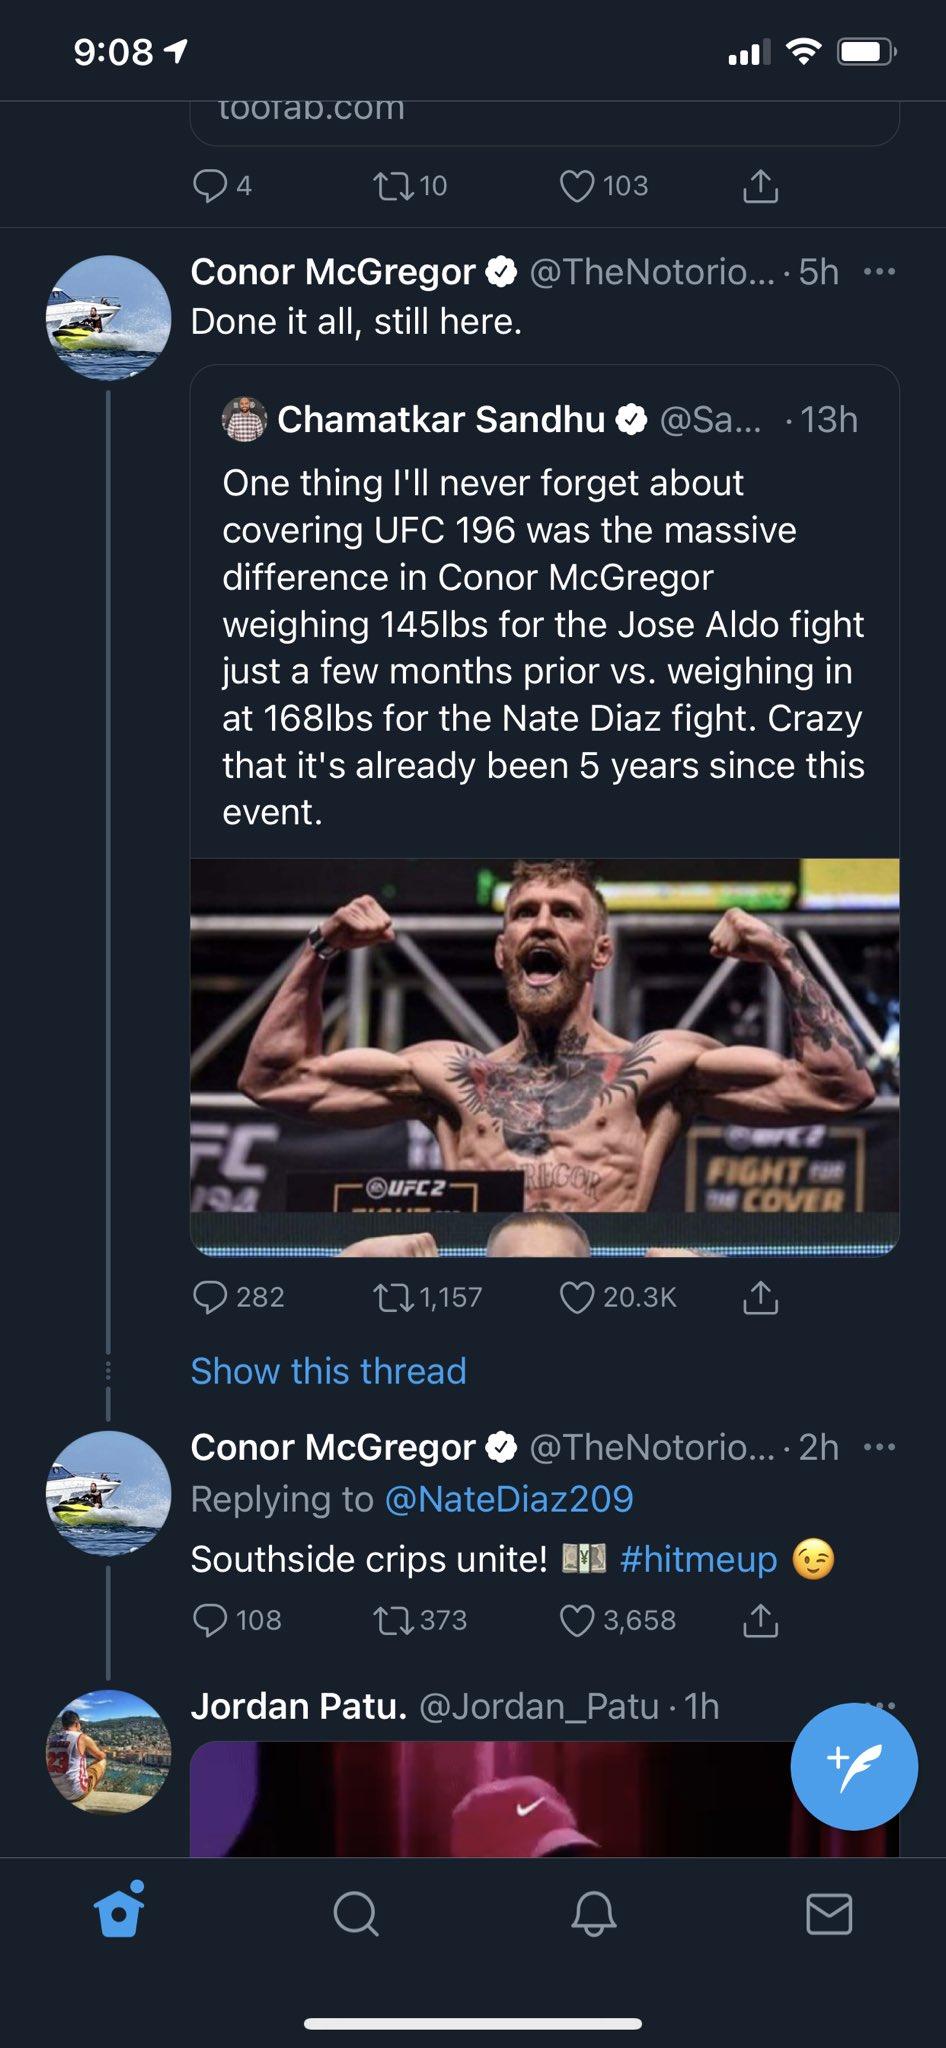 Conor McGregor Nate Diaz Twitterbråk